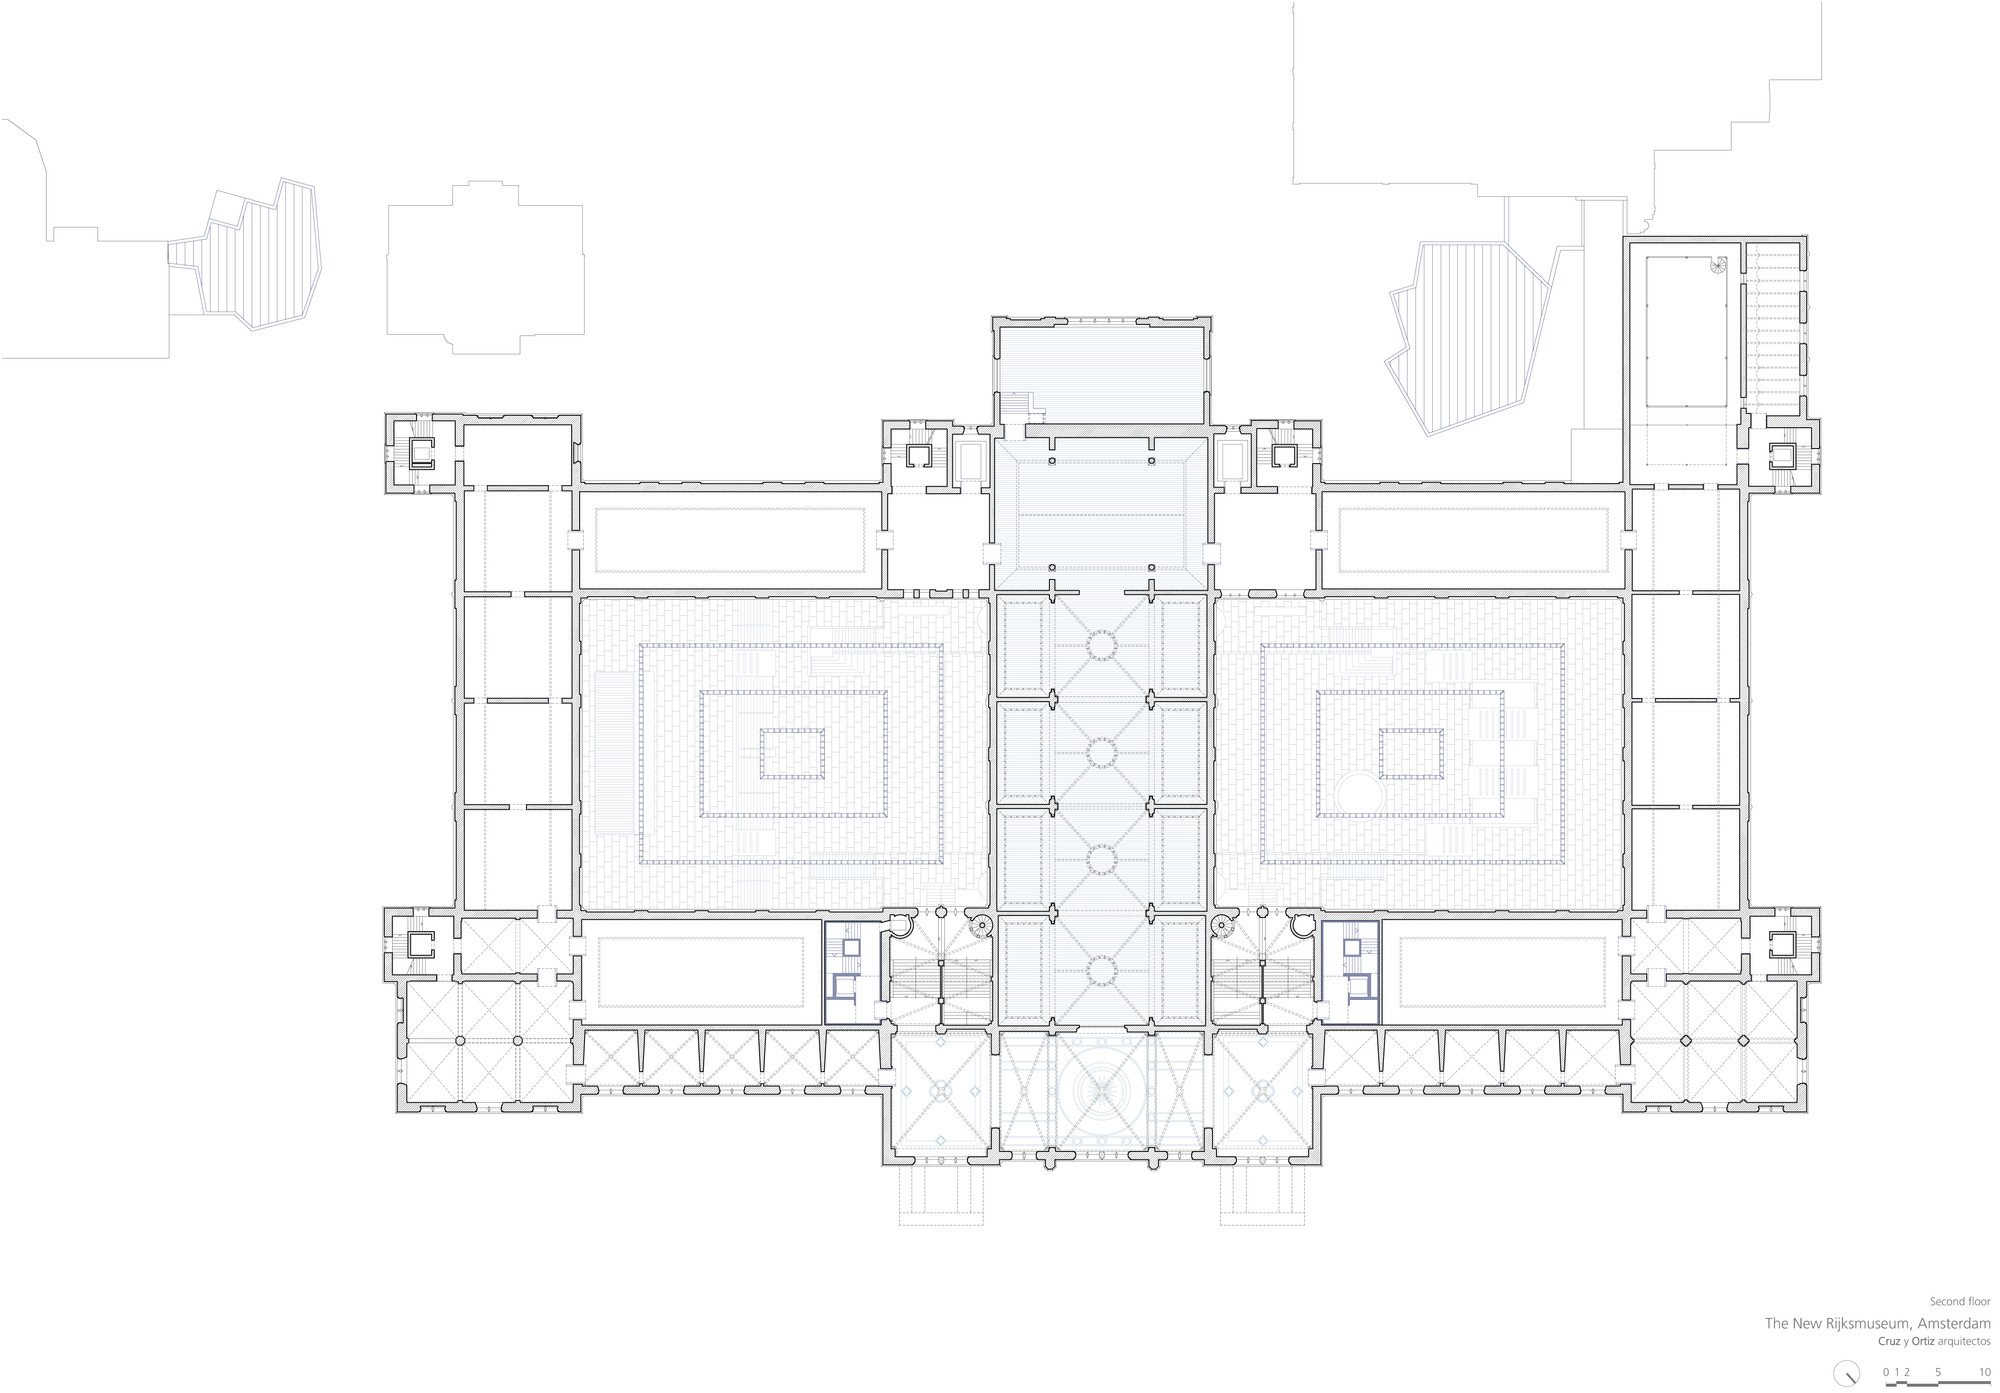 gallery of rijksmuseum cruz y ortiz arquitectos 22